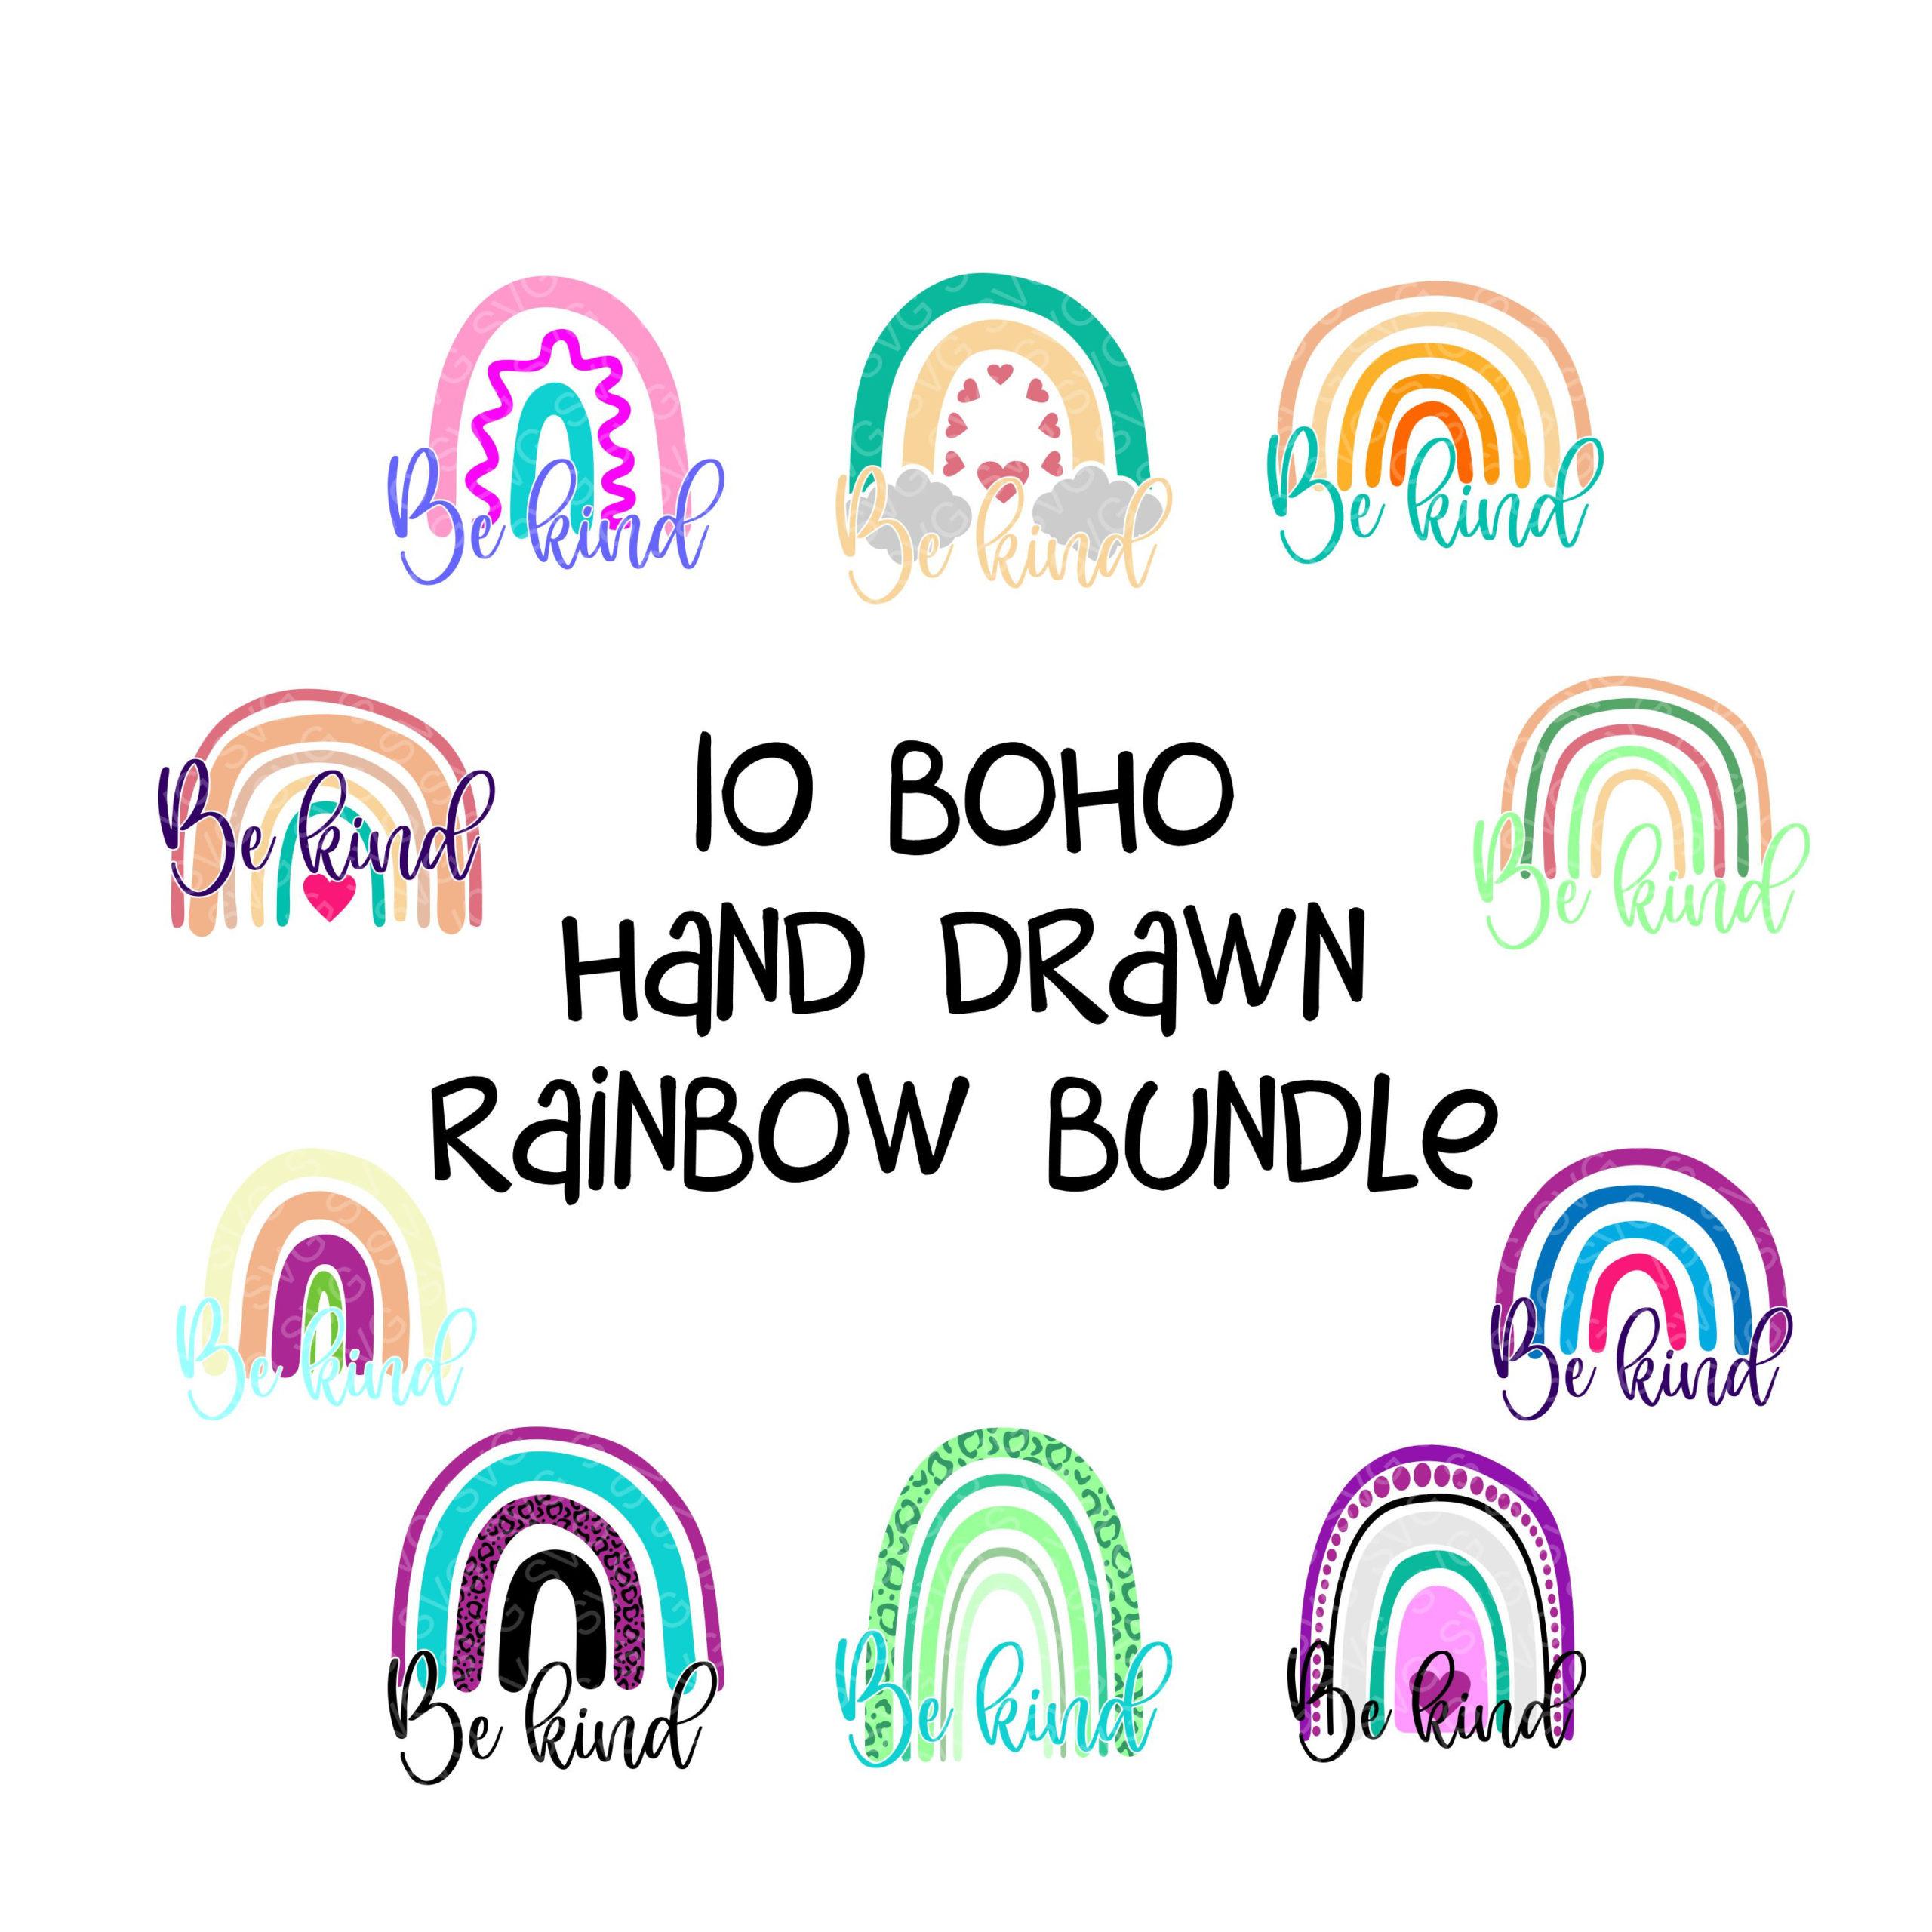 10-boho-rainbow-svg-design-bundle-rainbow-bundle-boho-rainbow-svg-boho-rainbow-svg-designs-rainbow-cut-file-hand-drawn-rainbow-bundle-60513fb9